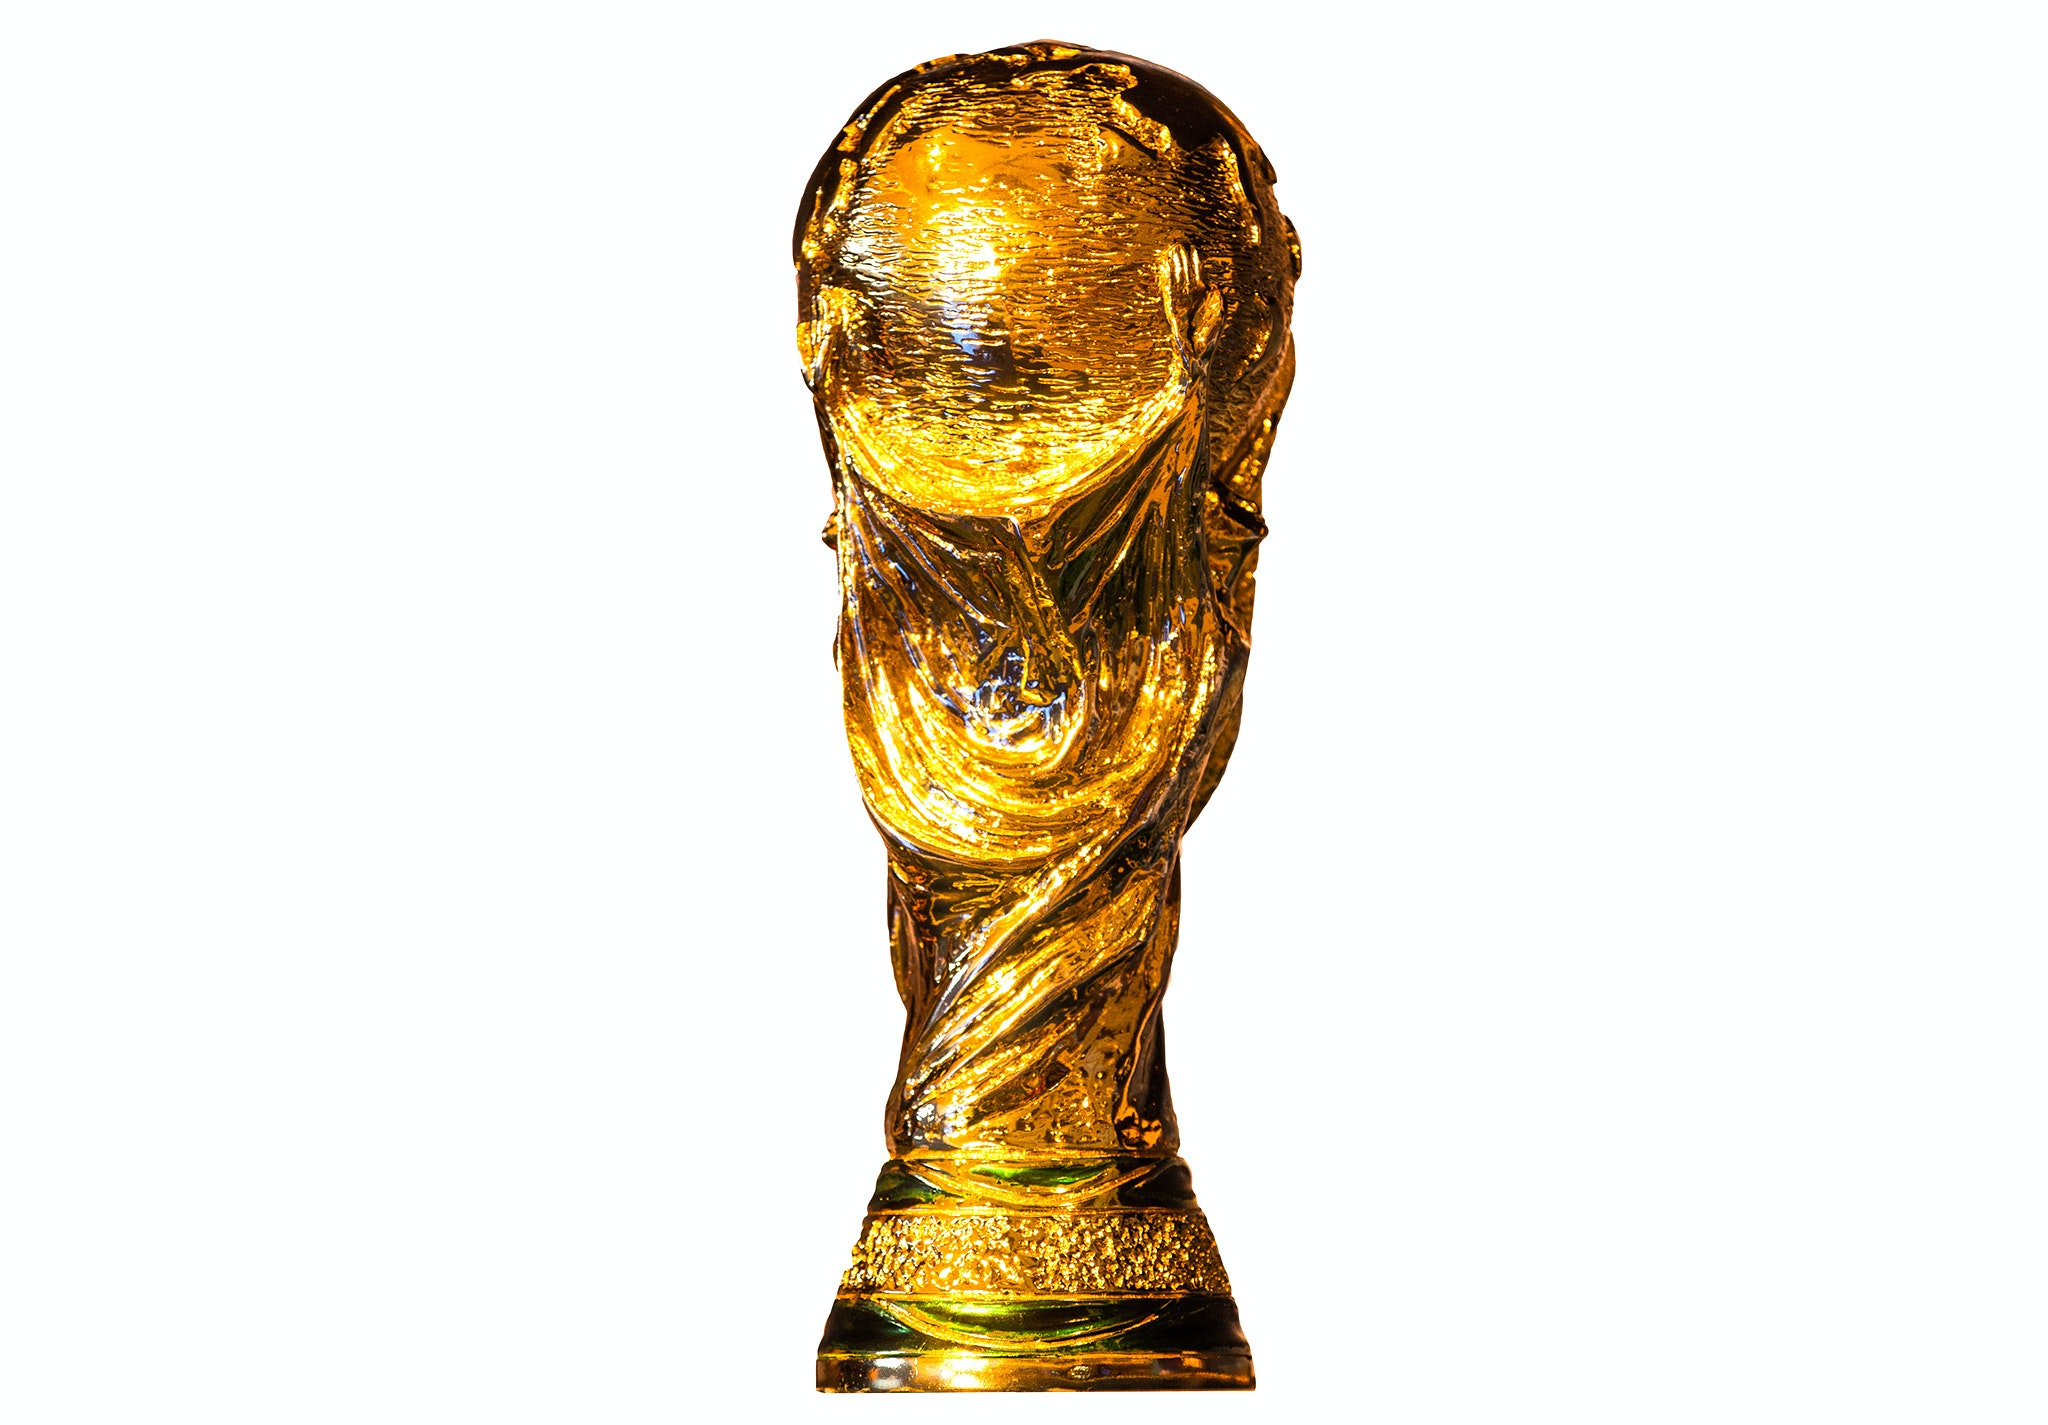 Fifa World Cup Qatar - 2022